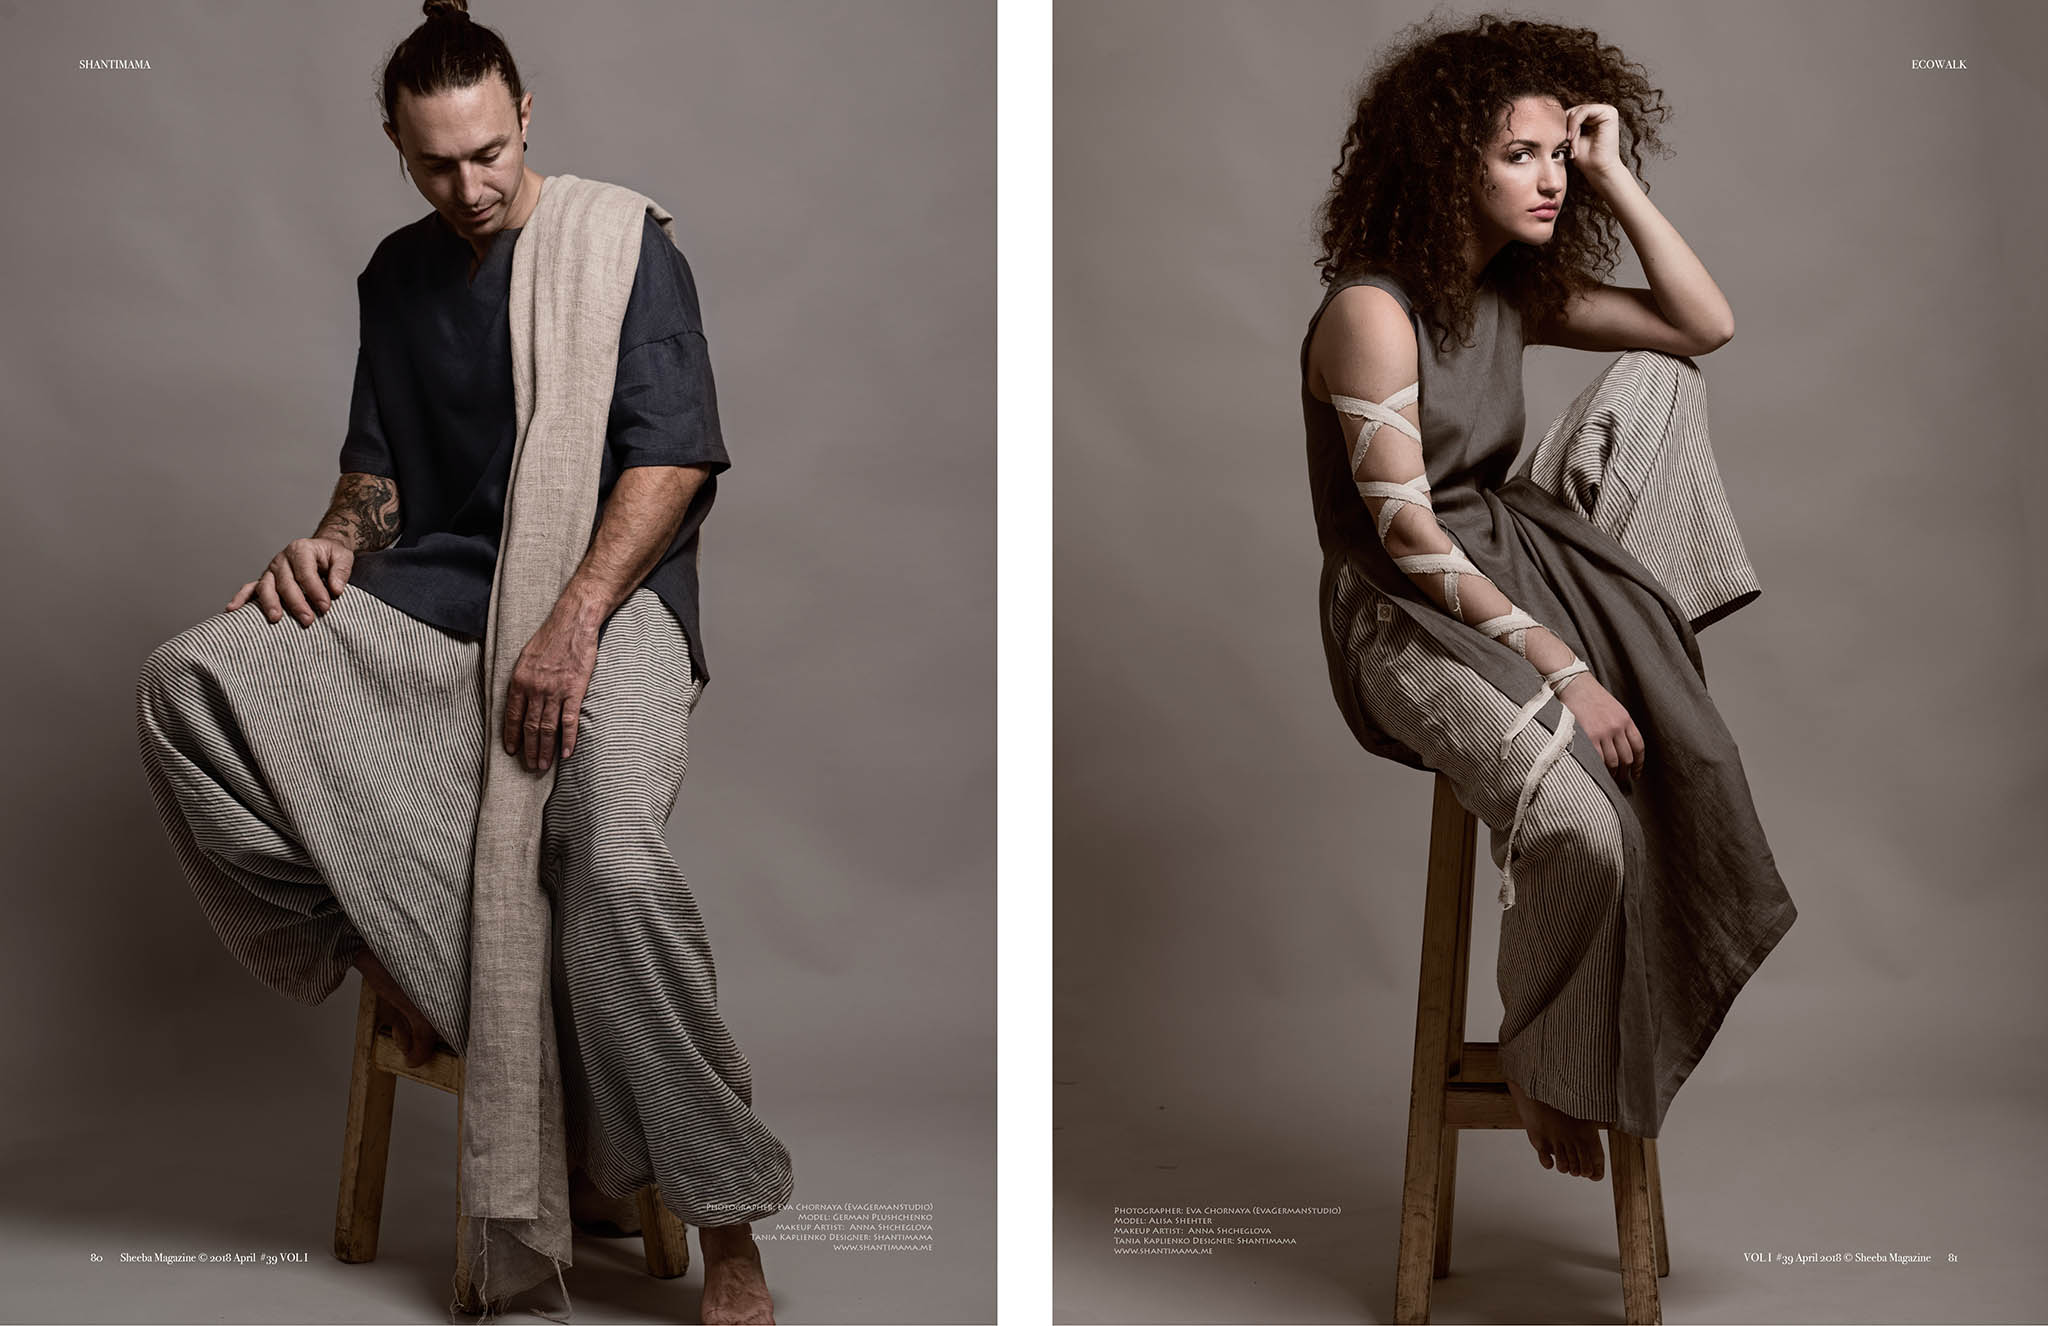 linen wear shantimama